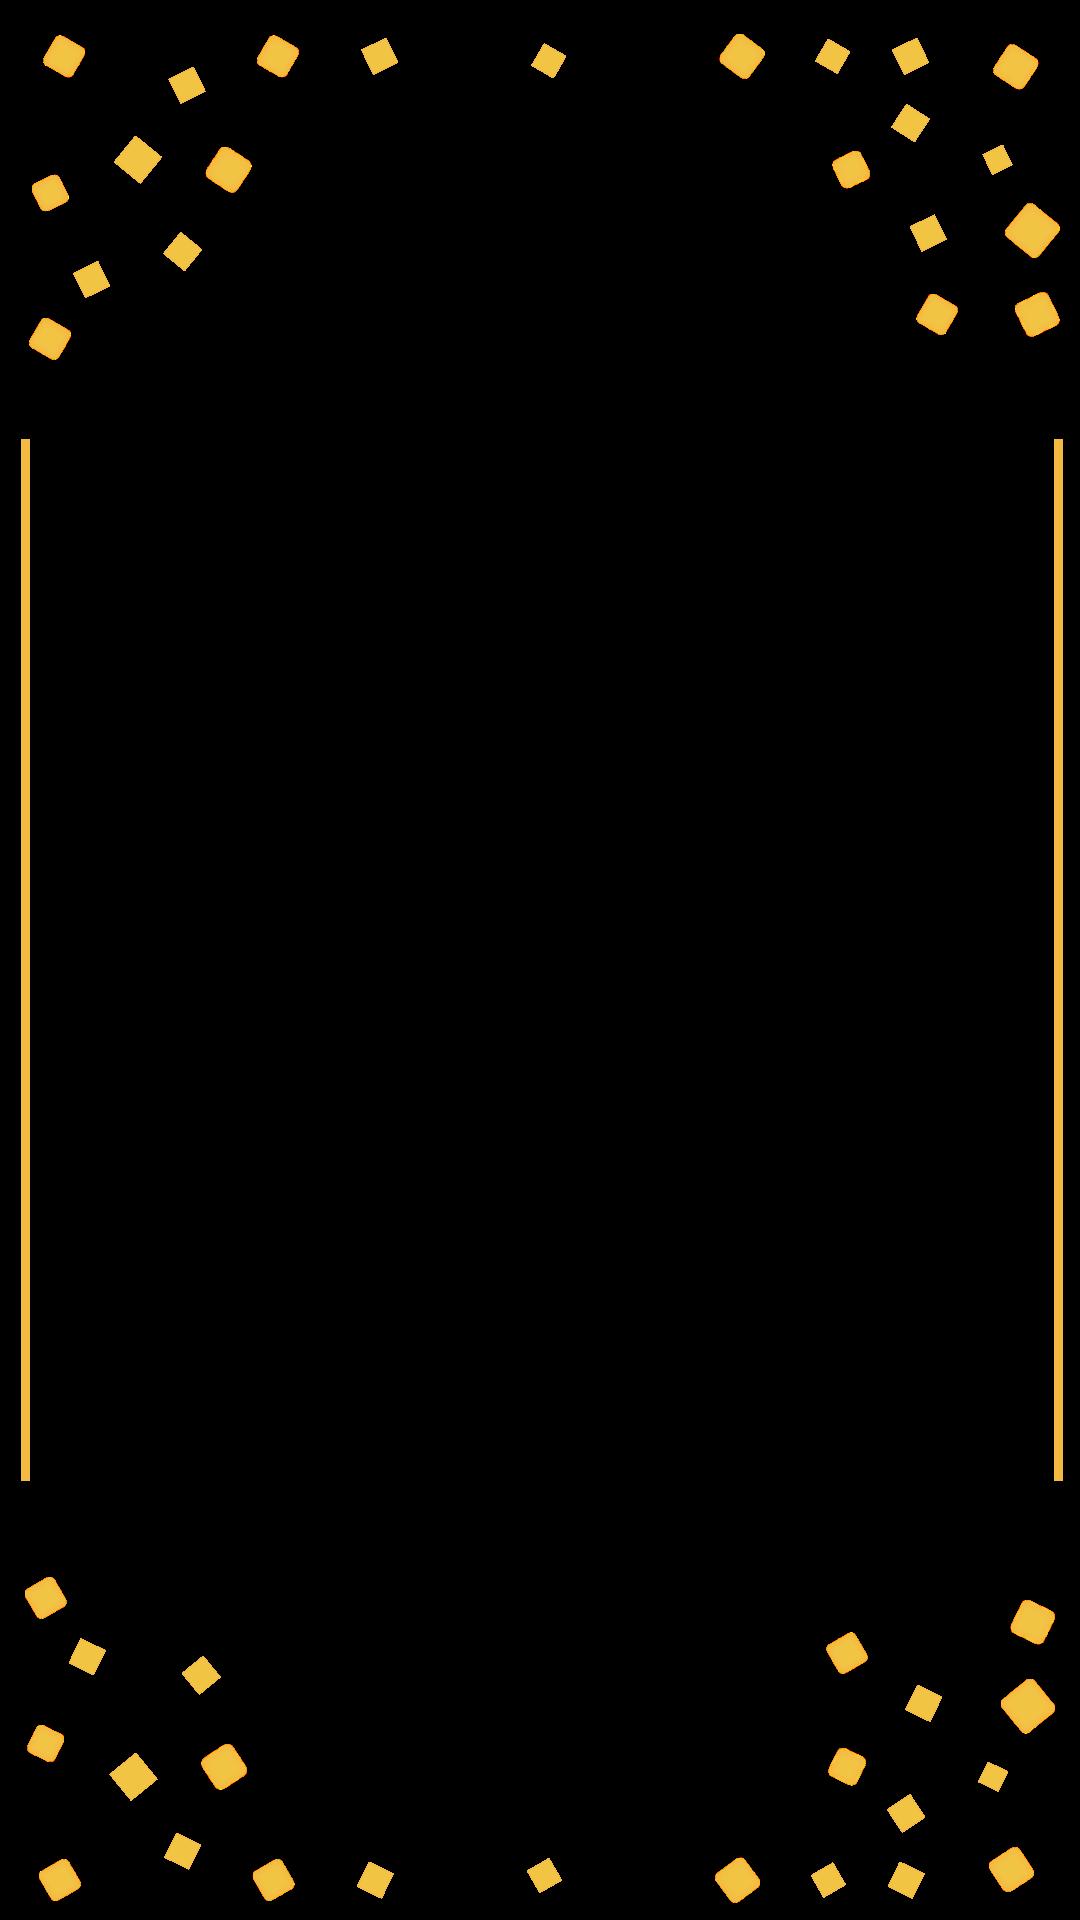 gold confetti border birthday snapchat filter geofilter maker on filterpop. Black Bedroom Furniture Sets. Home Design Ideas